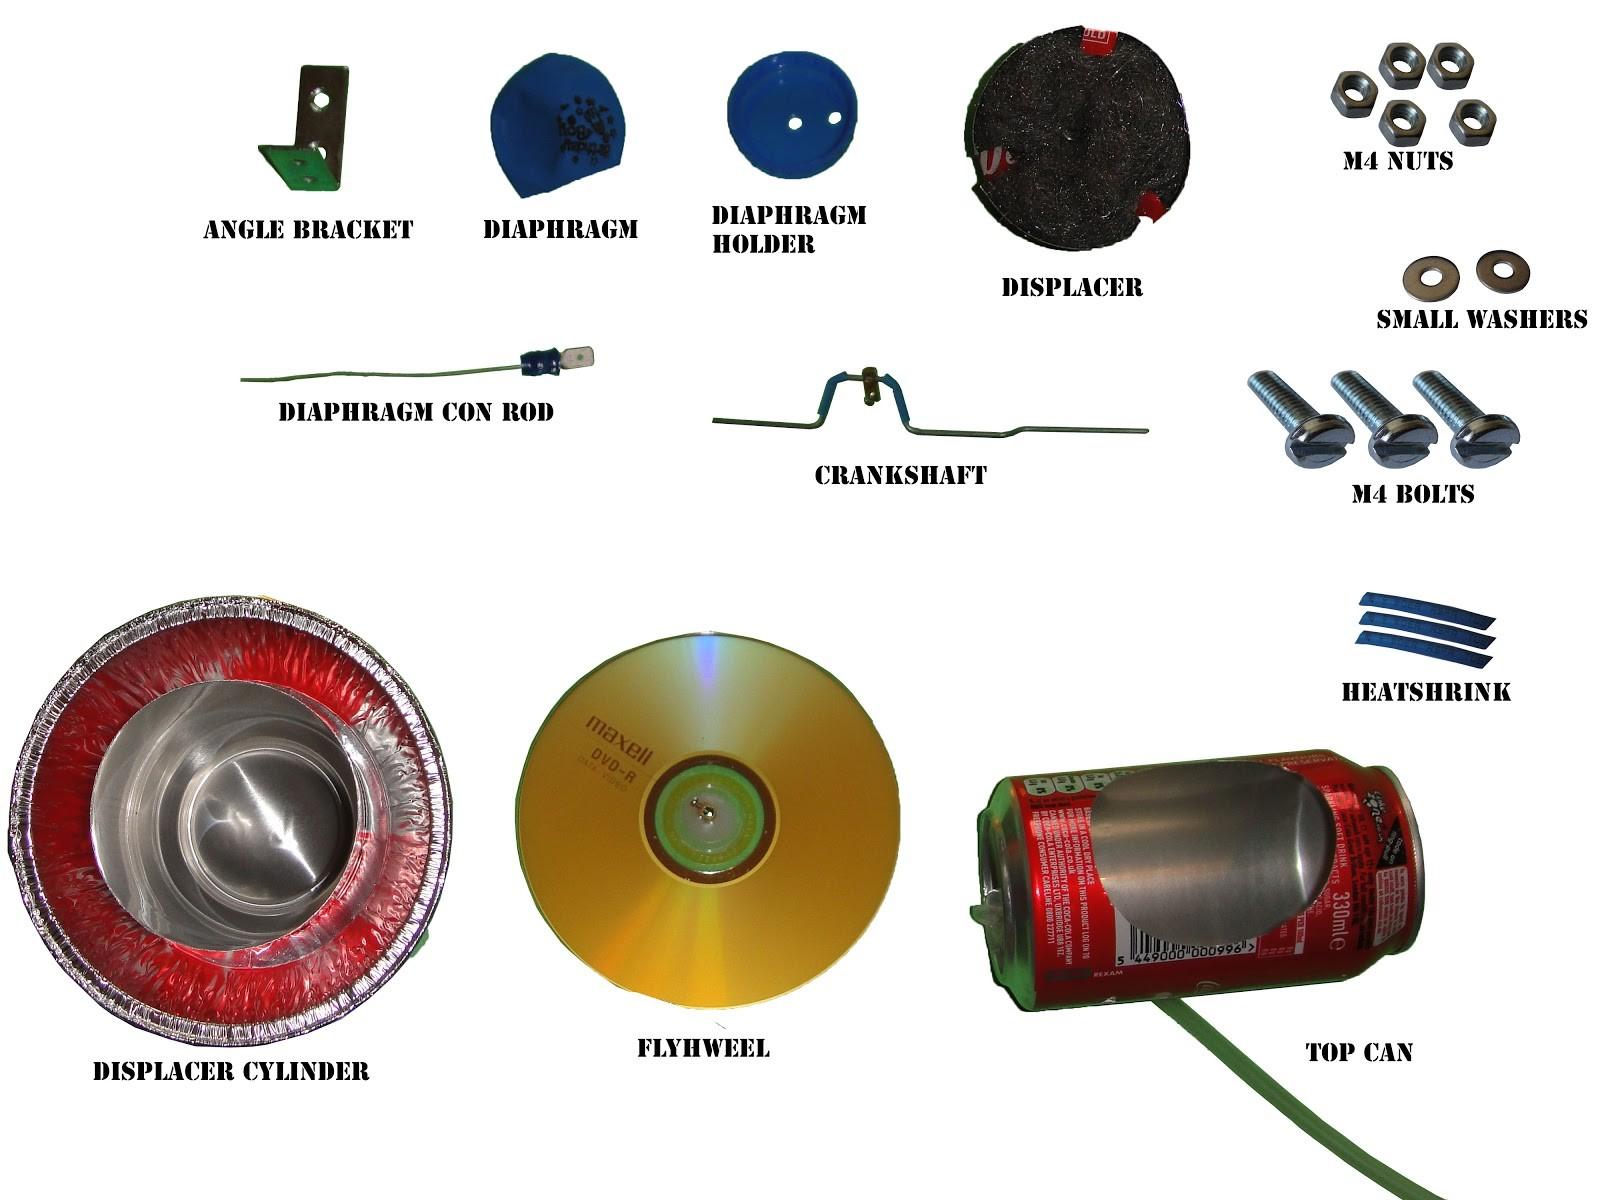 Stirling Engine Diagram Stirling Engine Kit assembly Instruction Scrap to Power Of Stirling Engine Diagram